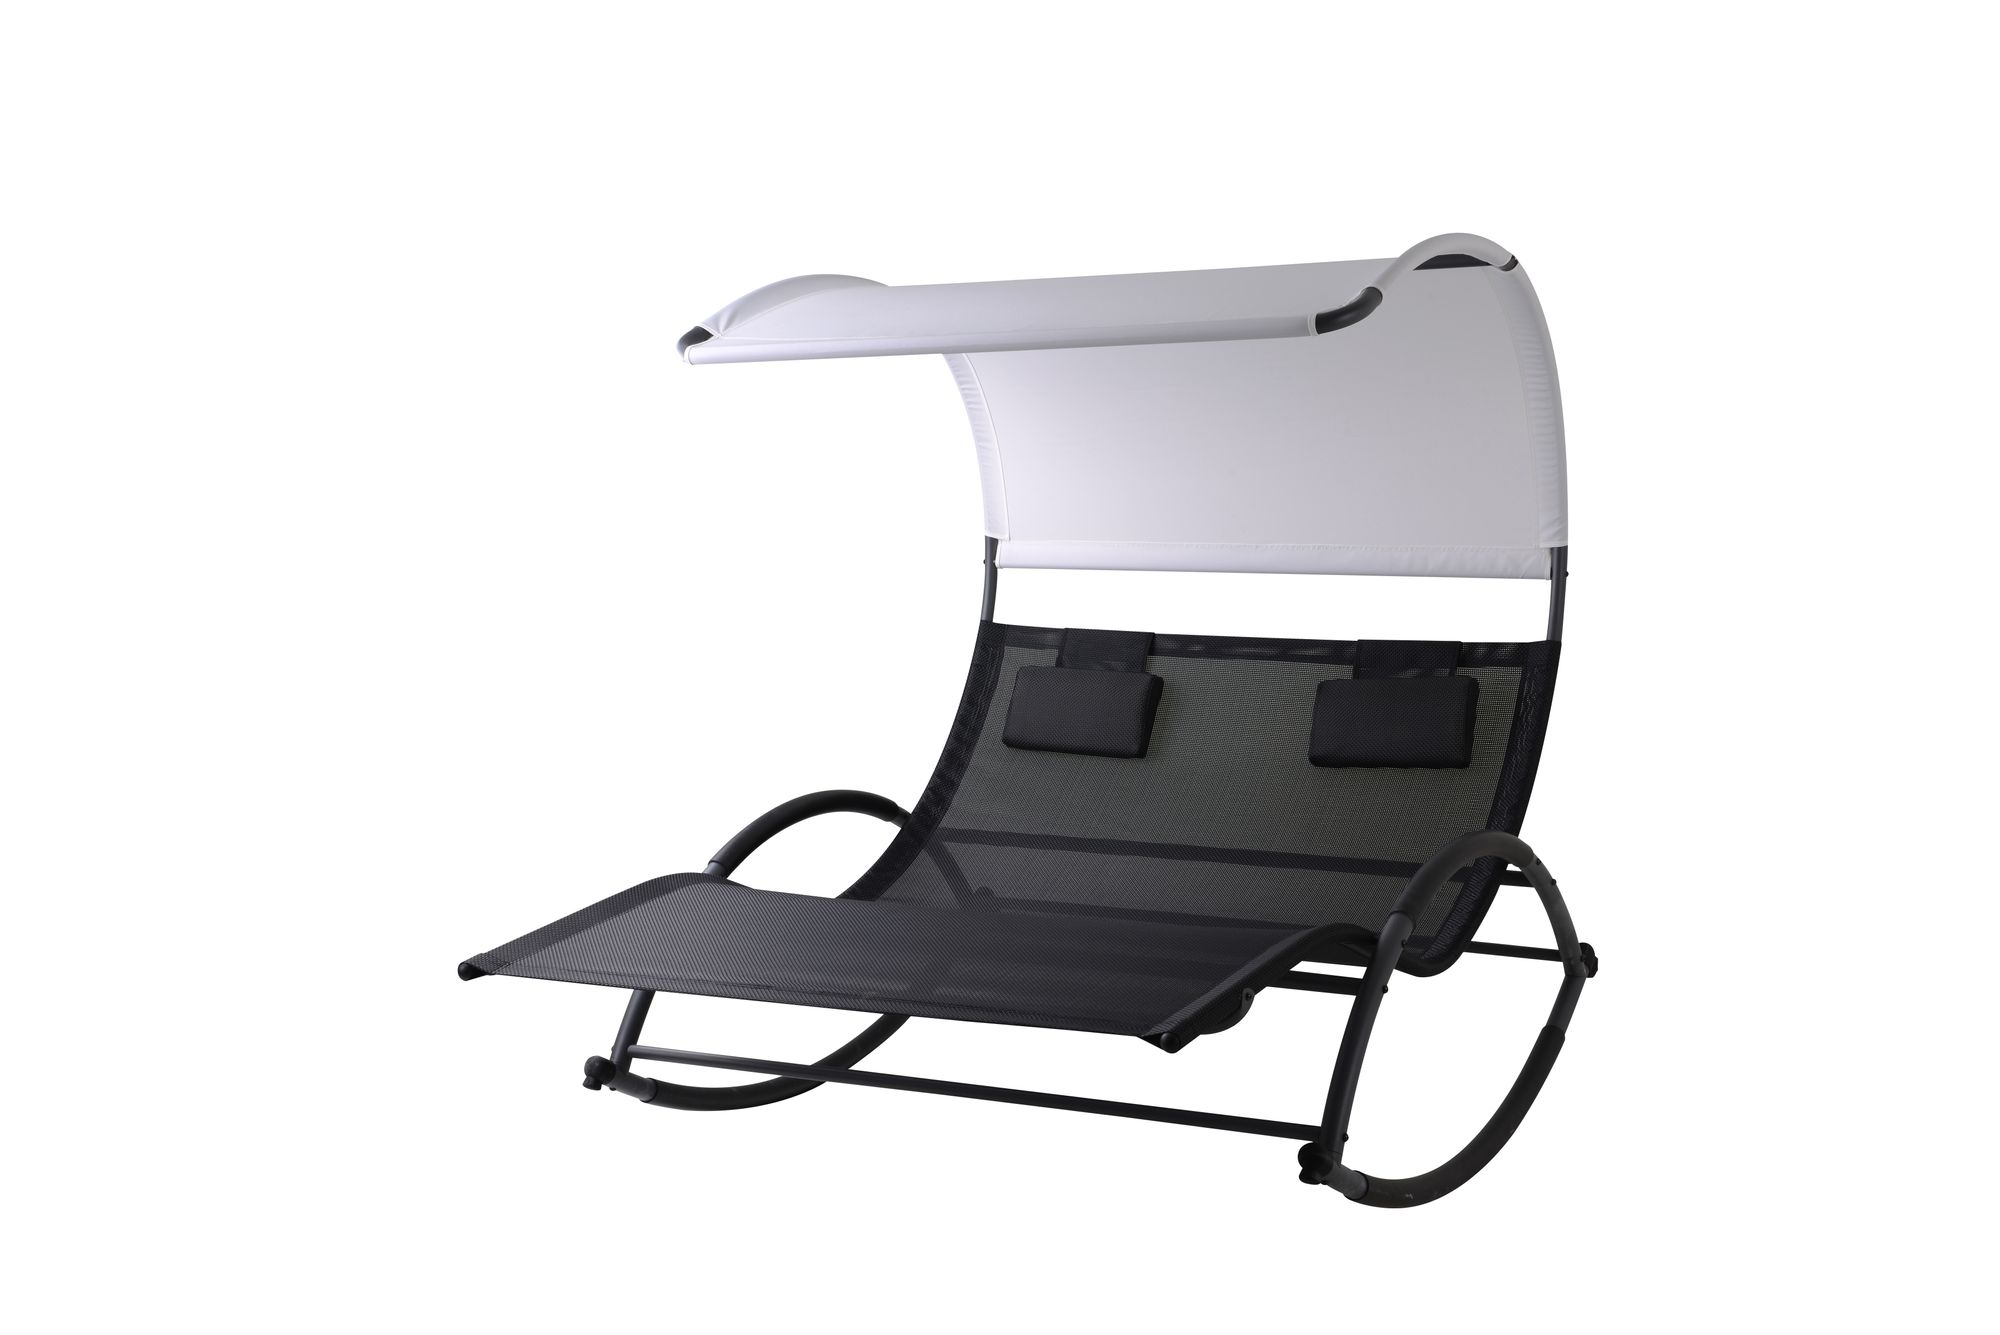 doppel schaukelliege sonnenliege aus atmungsaktivem. Black Bedroom Furniture Sets. Home Design Ideas